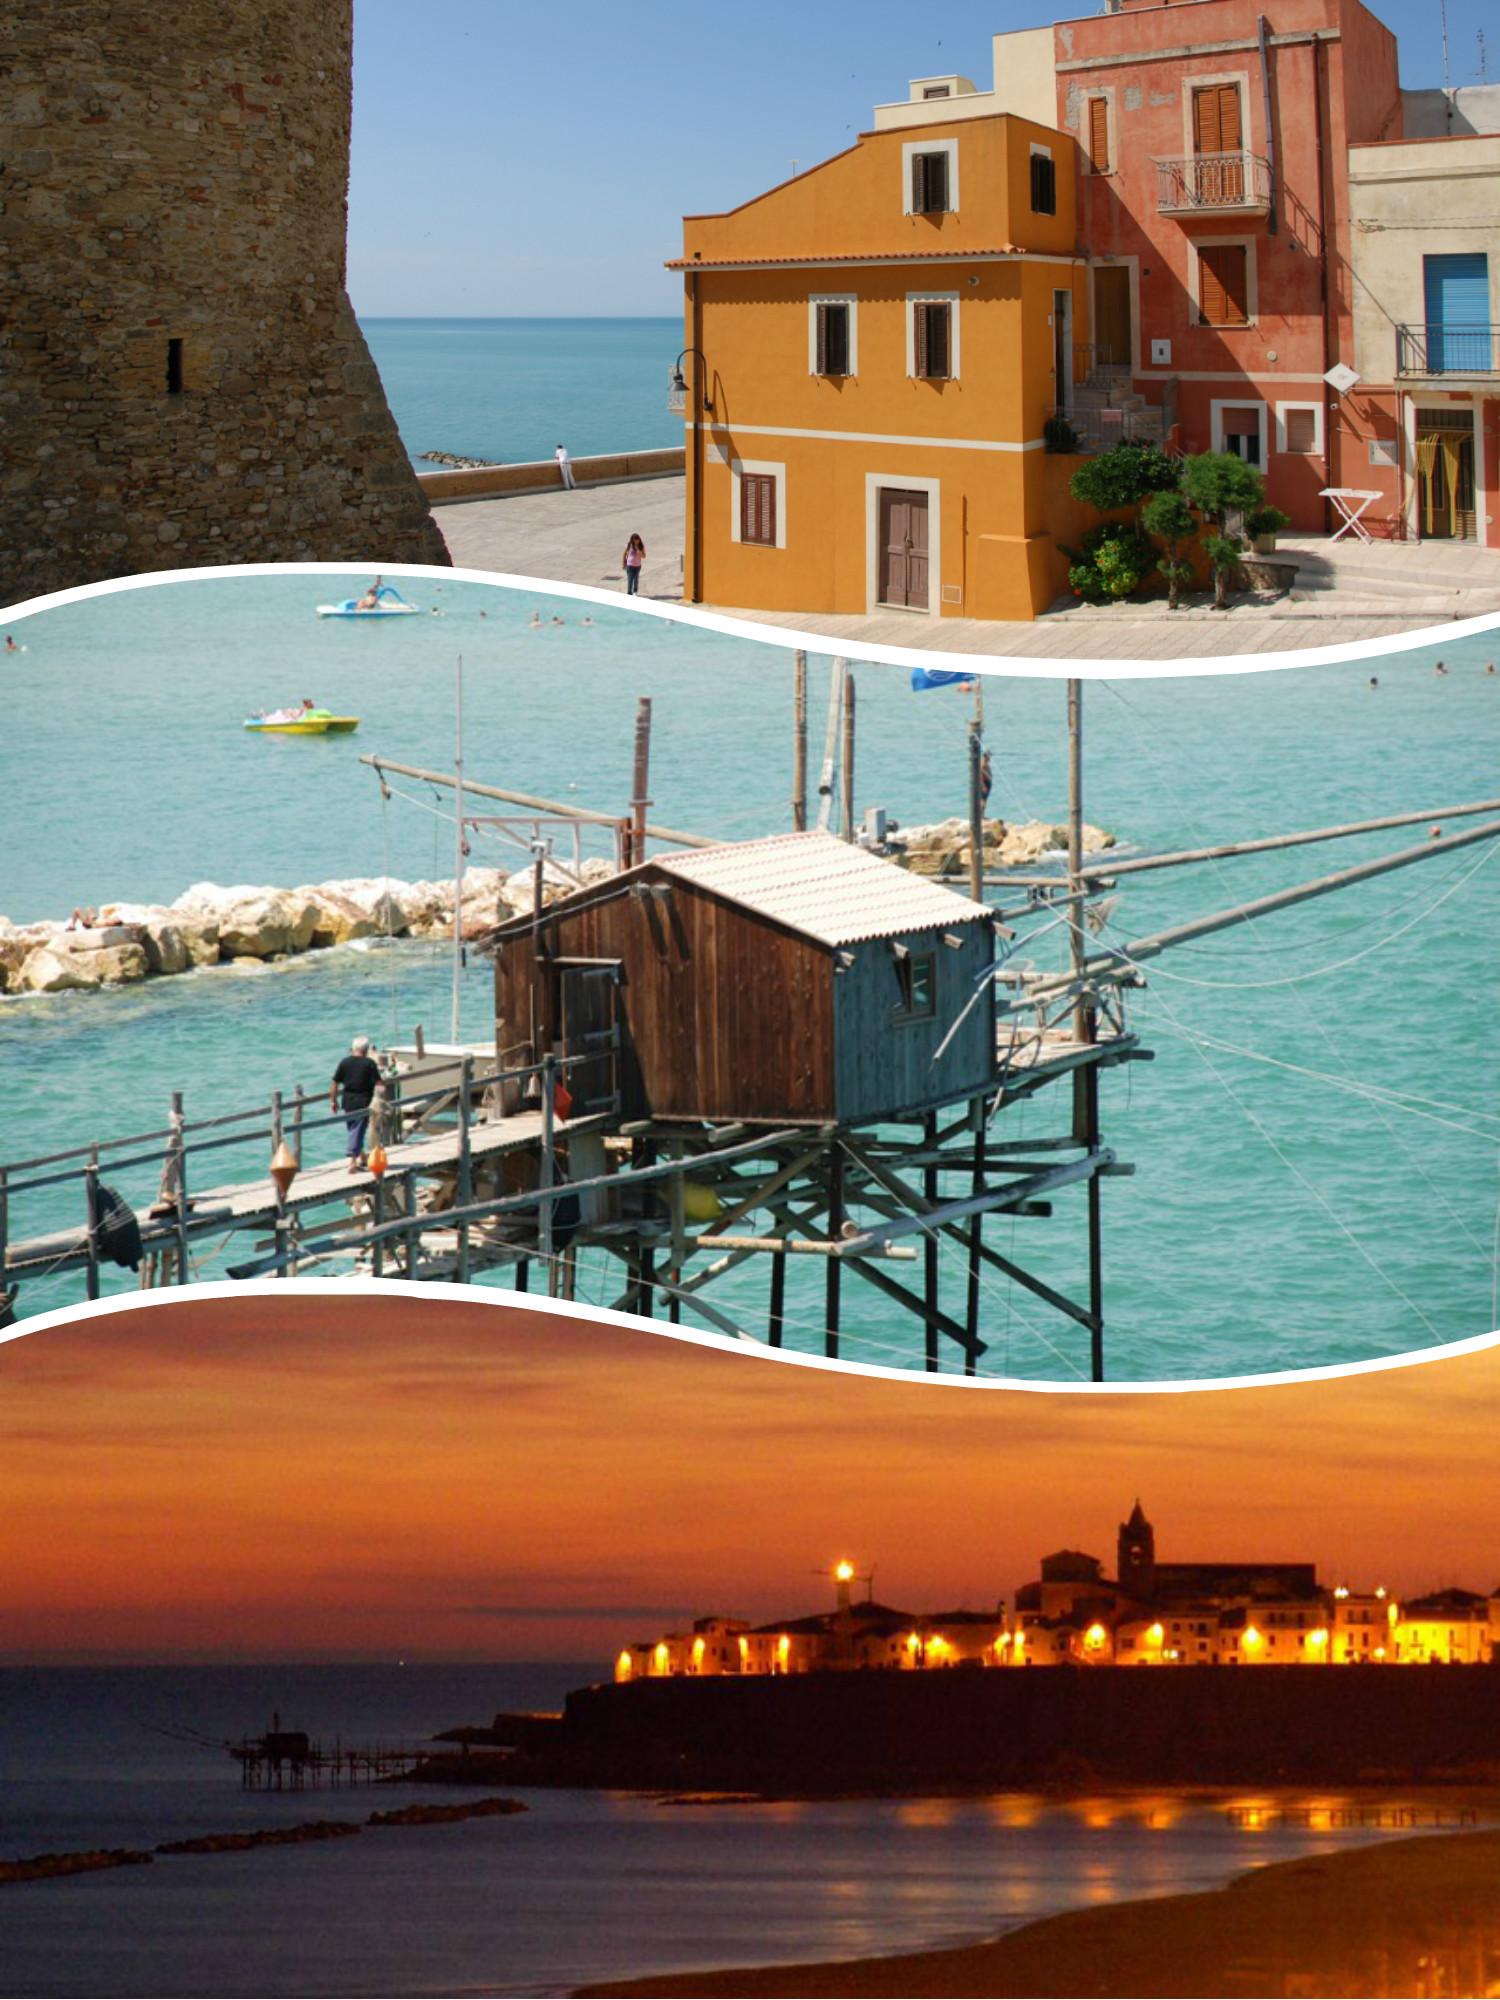 Molise-Adriatc-coast